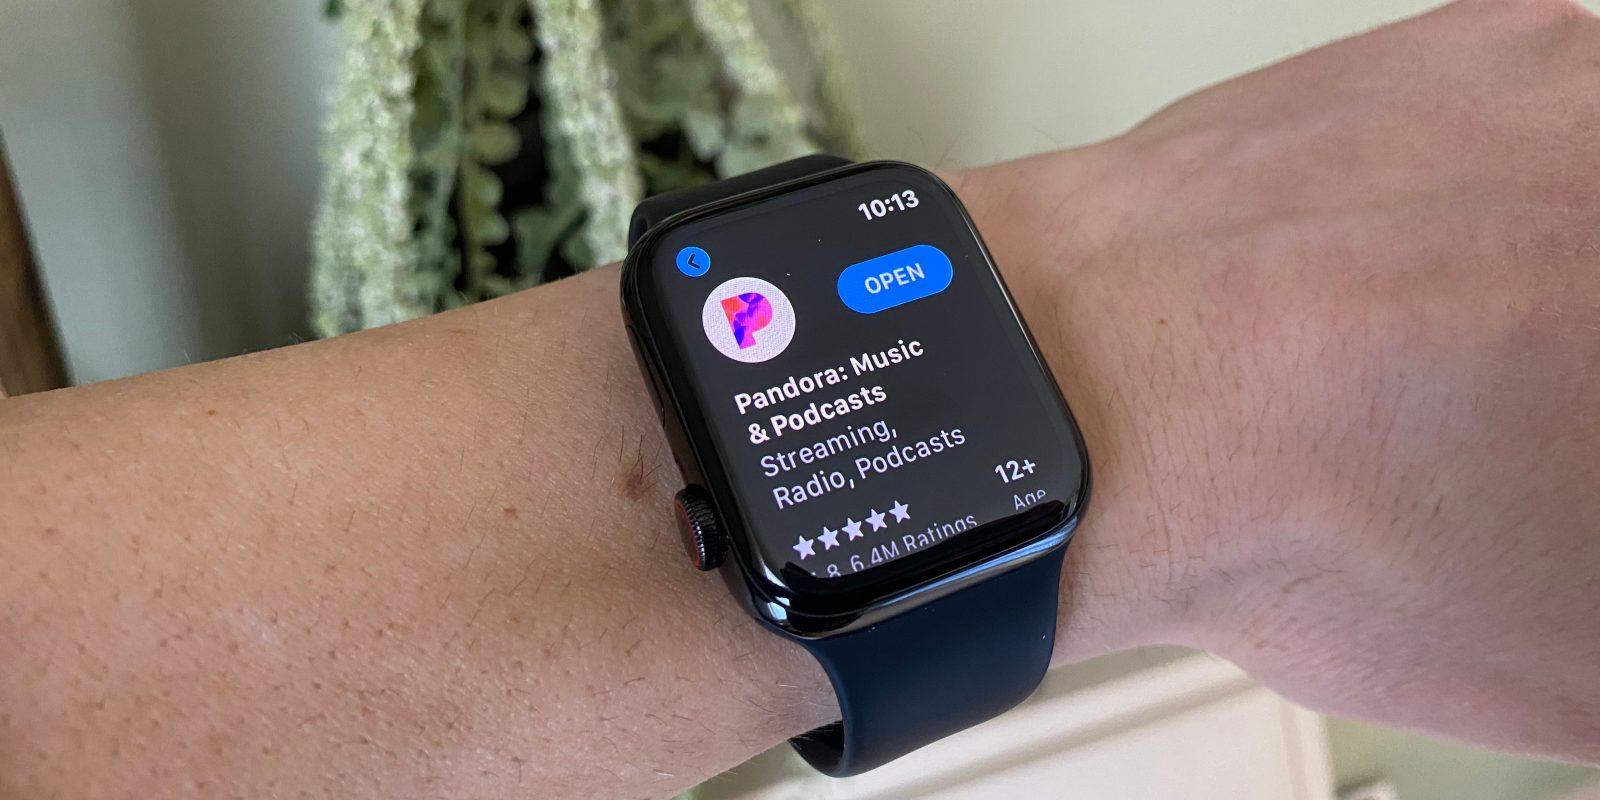 https://9to5mac.com/wp-content/uploads/sites/6/2020/02/pandora-apple-watch-streaming-music.jpeg?quality=82&strip=all&w=1600